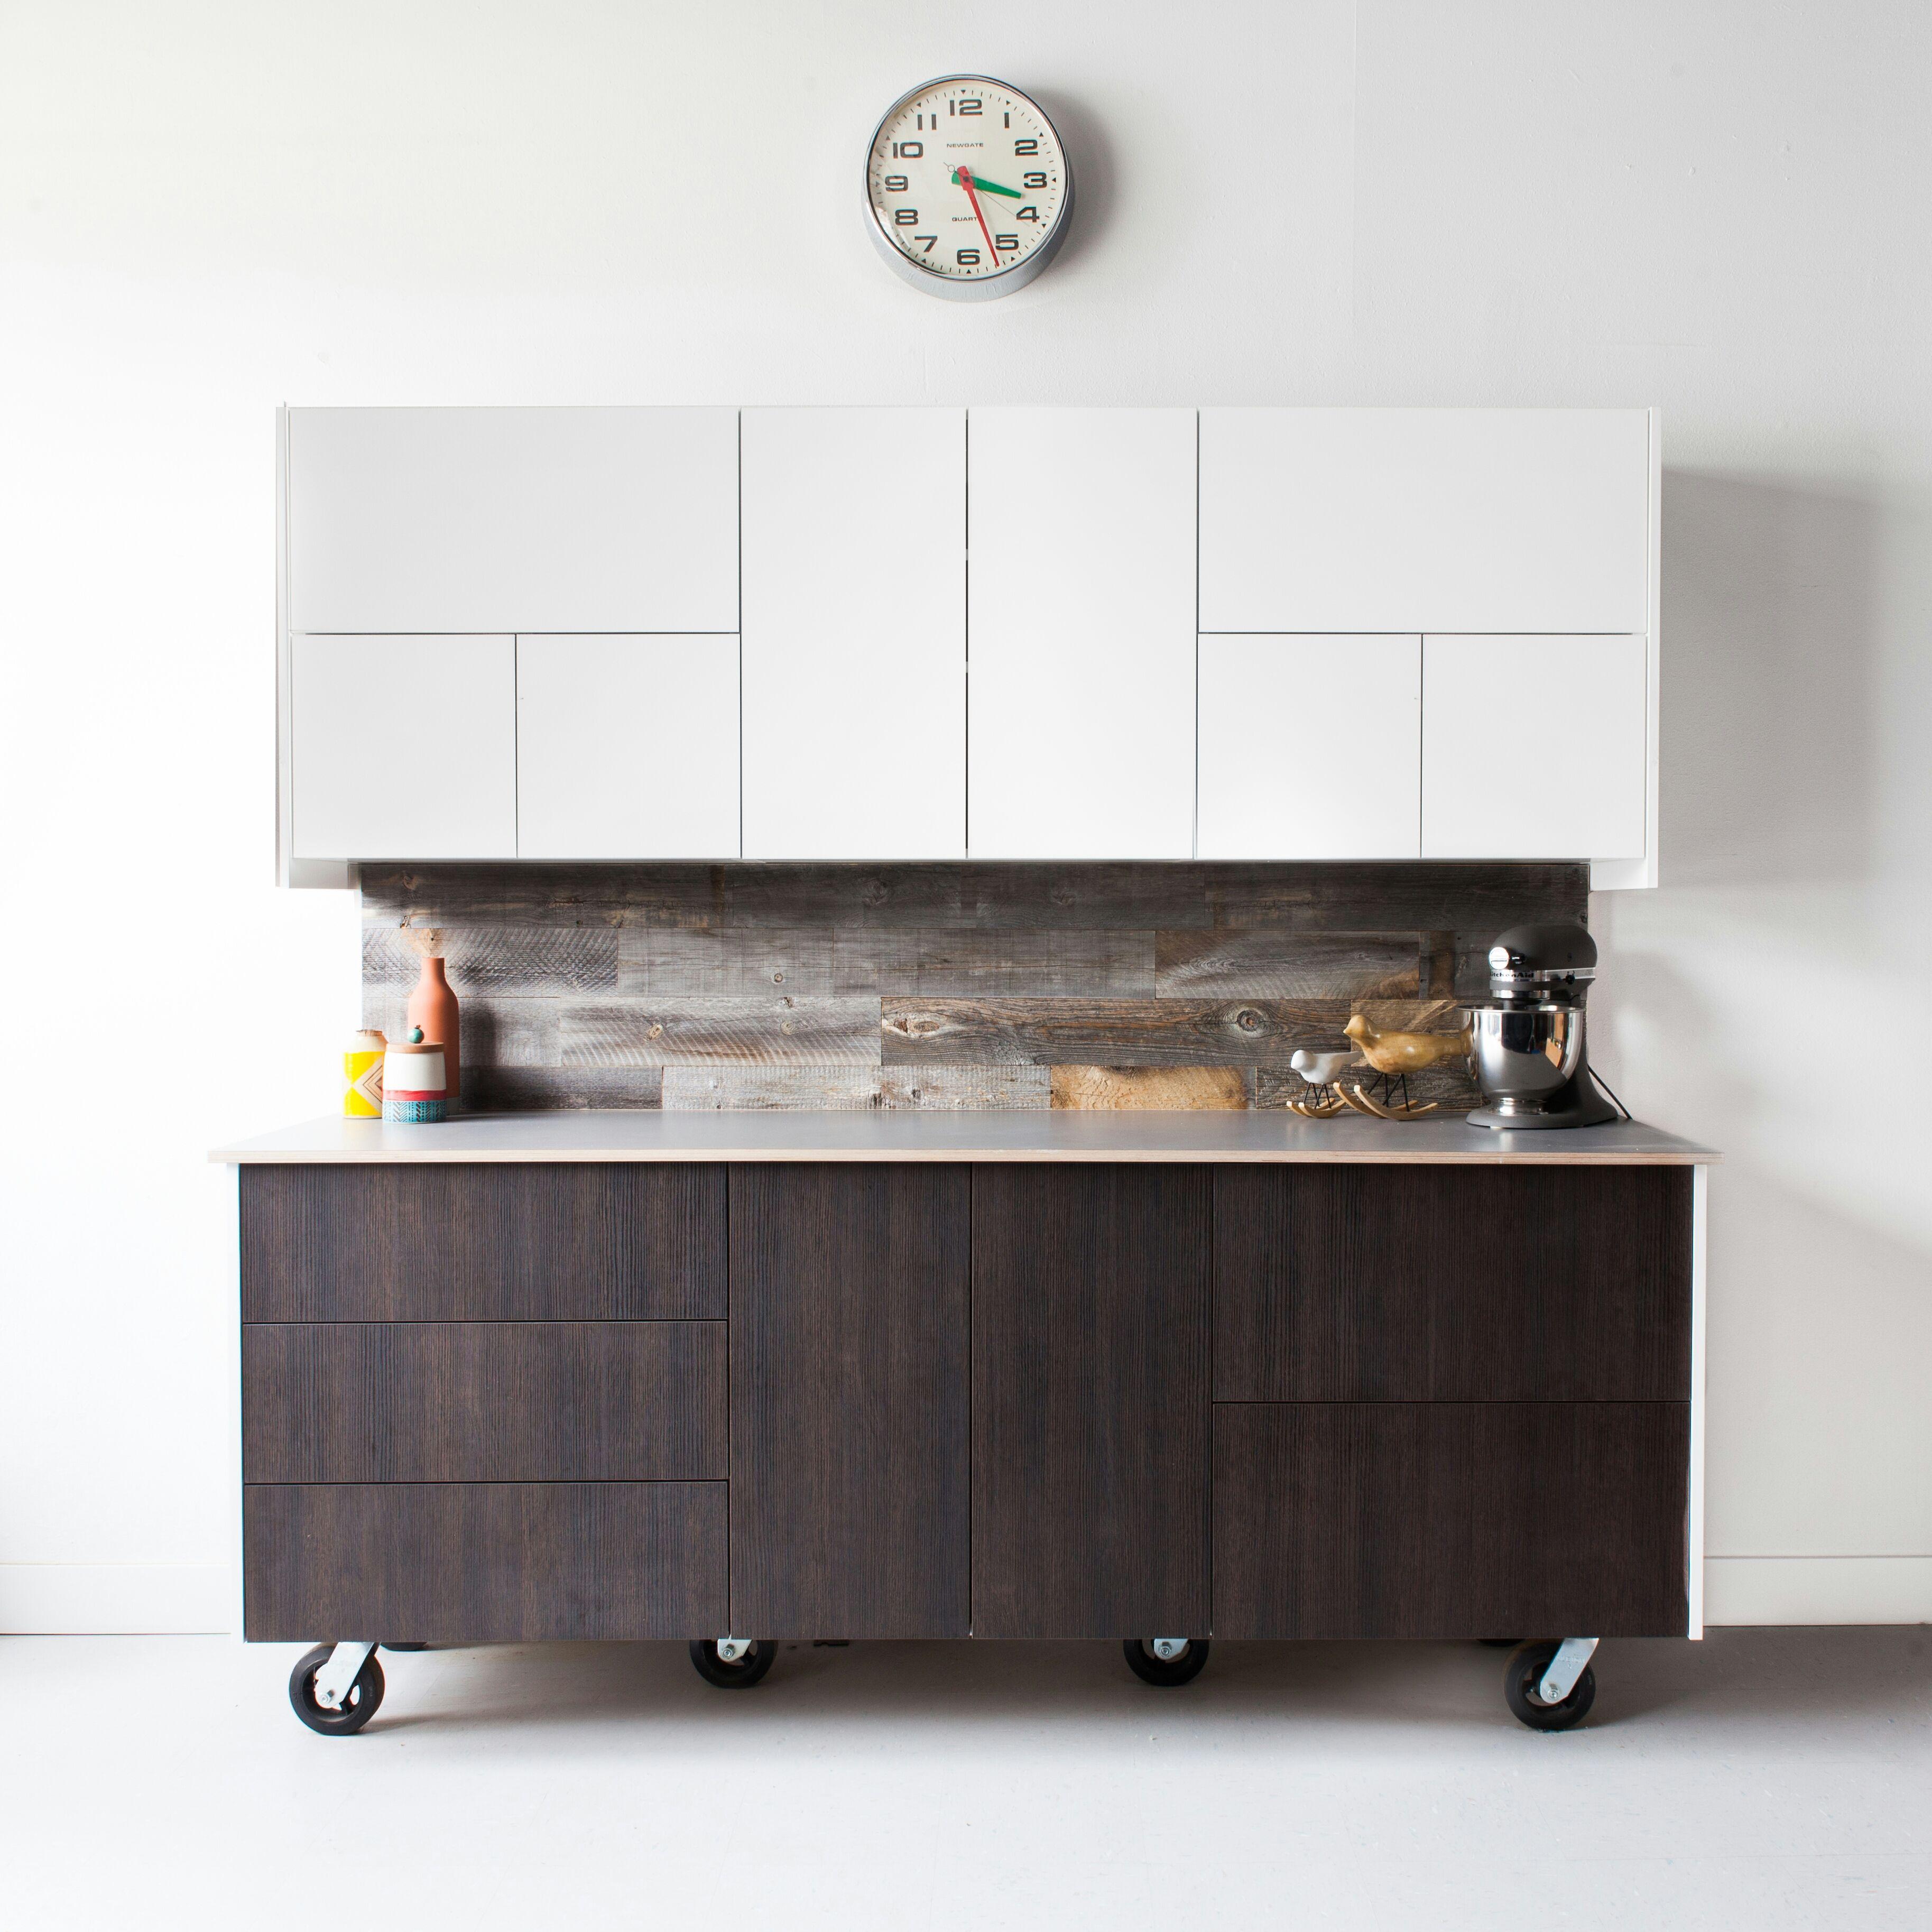 Semihandmade Charcoal Ikea Kitchen Ikea Cabinets Ikea Kitchen Cabinets Kitchen Cabinets